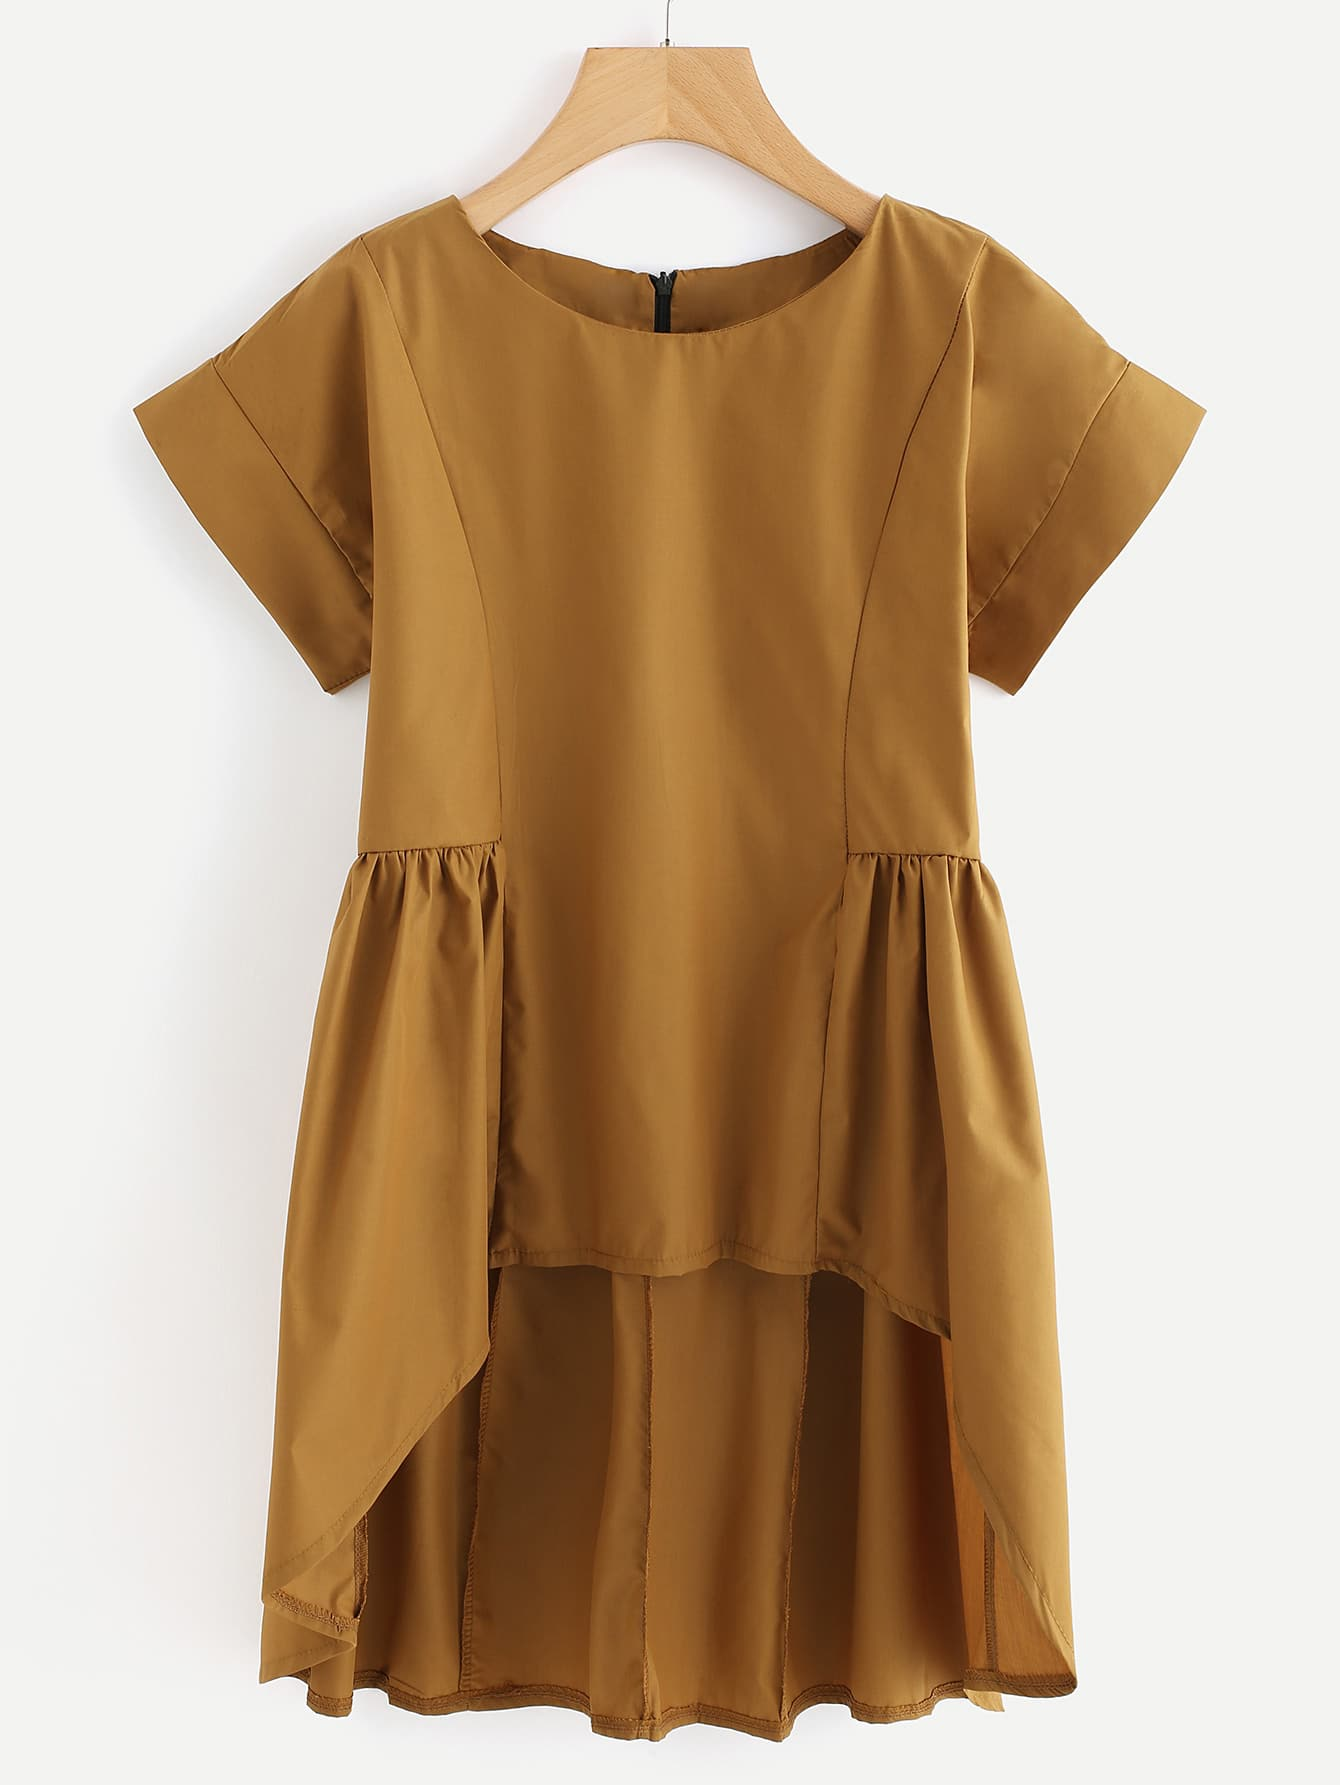 Dip Hem Zipper Back Blouse blouse170817111